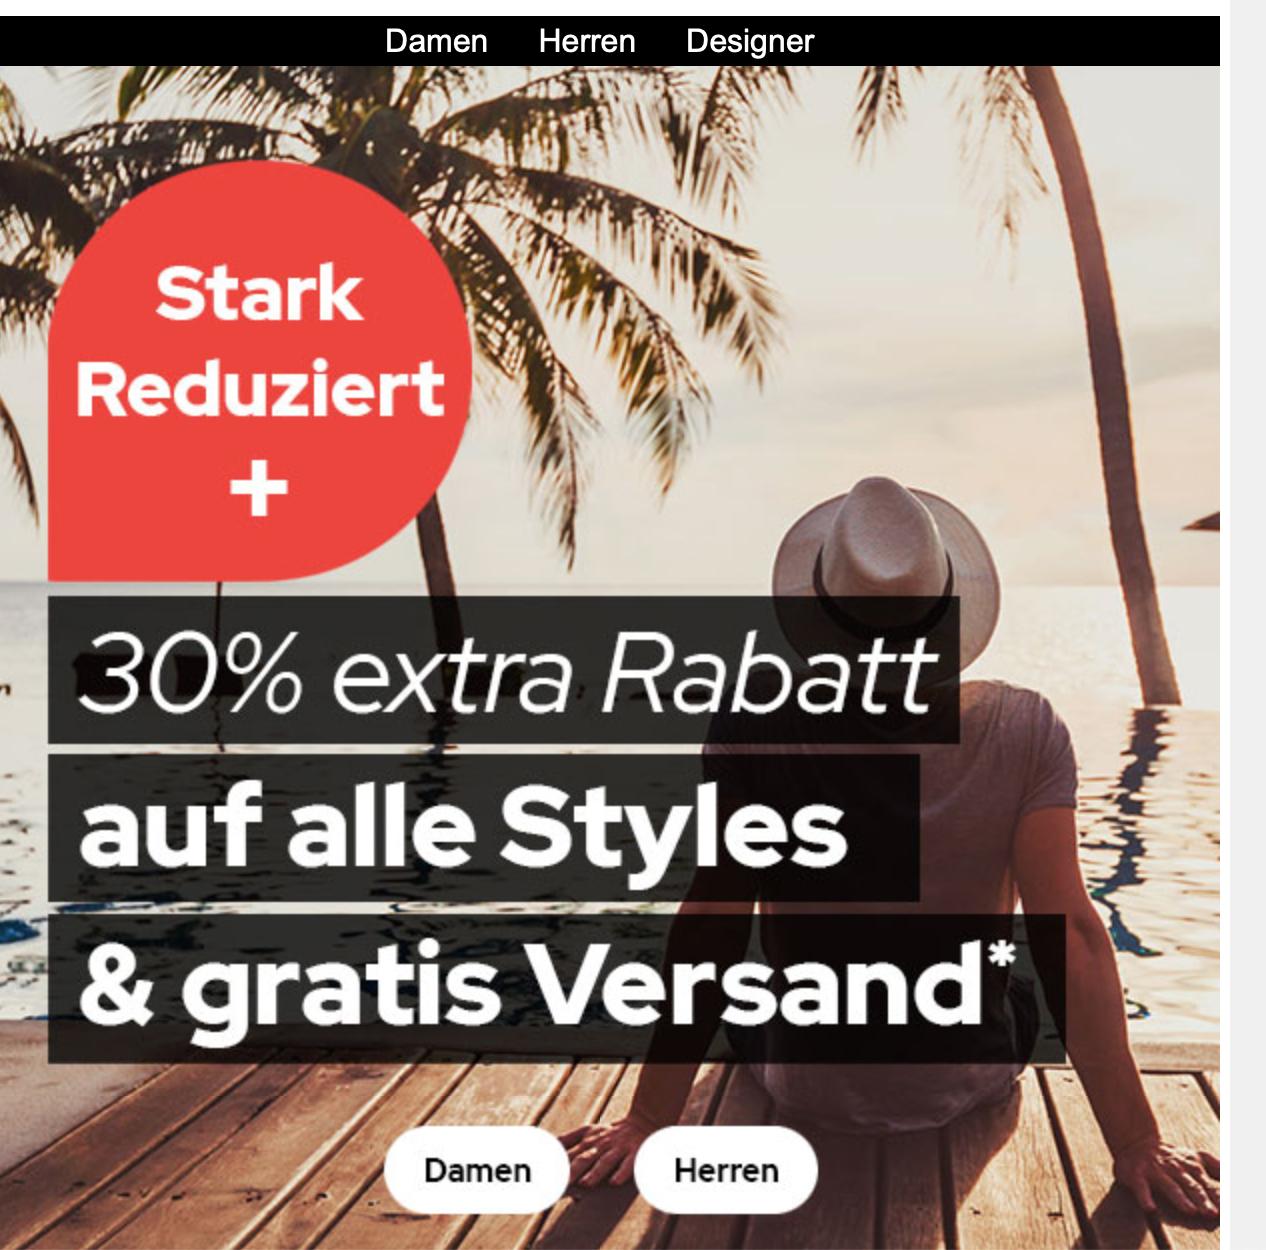 50% Summer Sale + Rabatte bei Dress-for-less